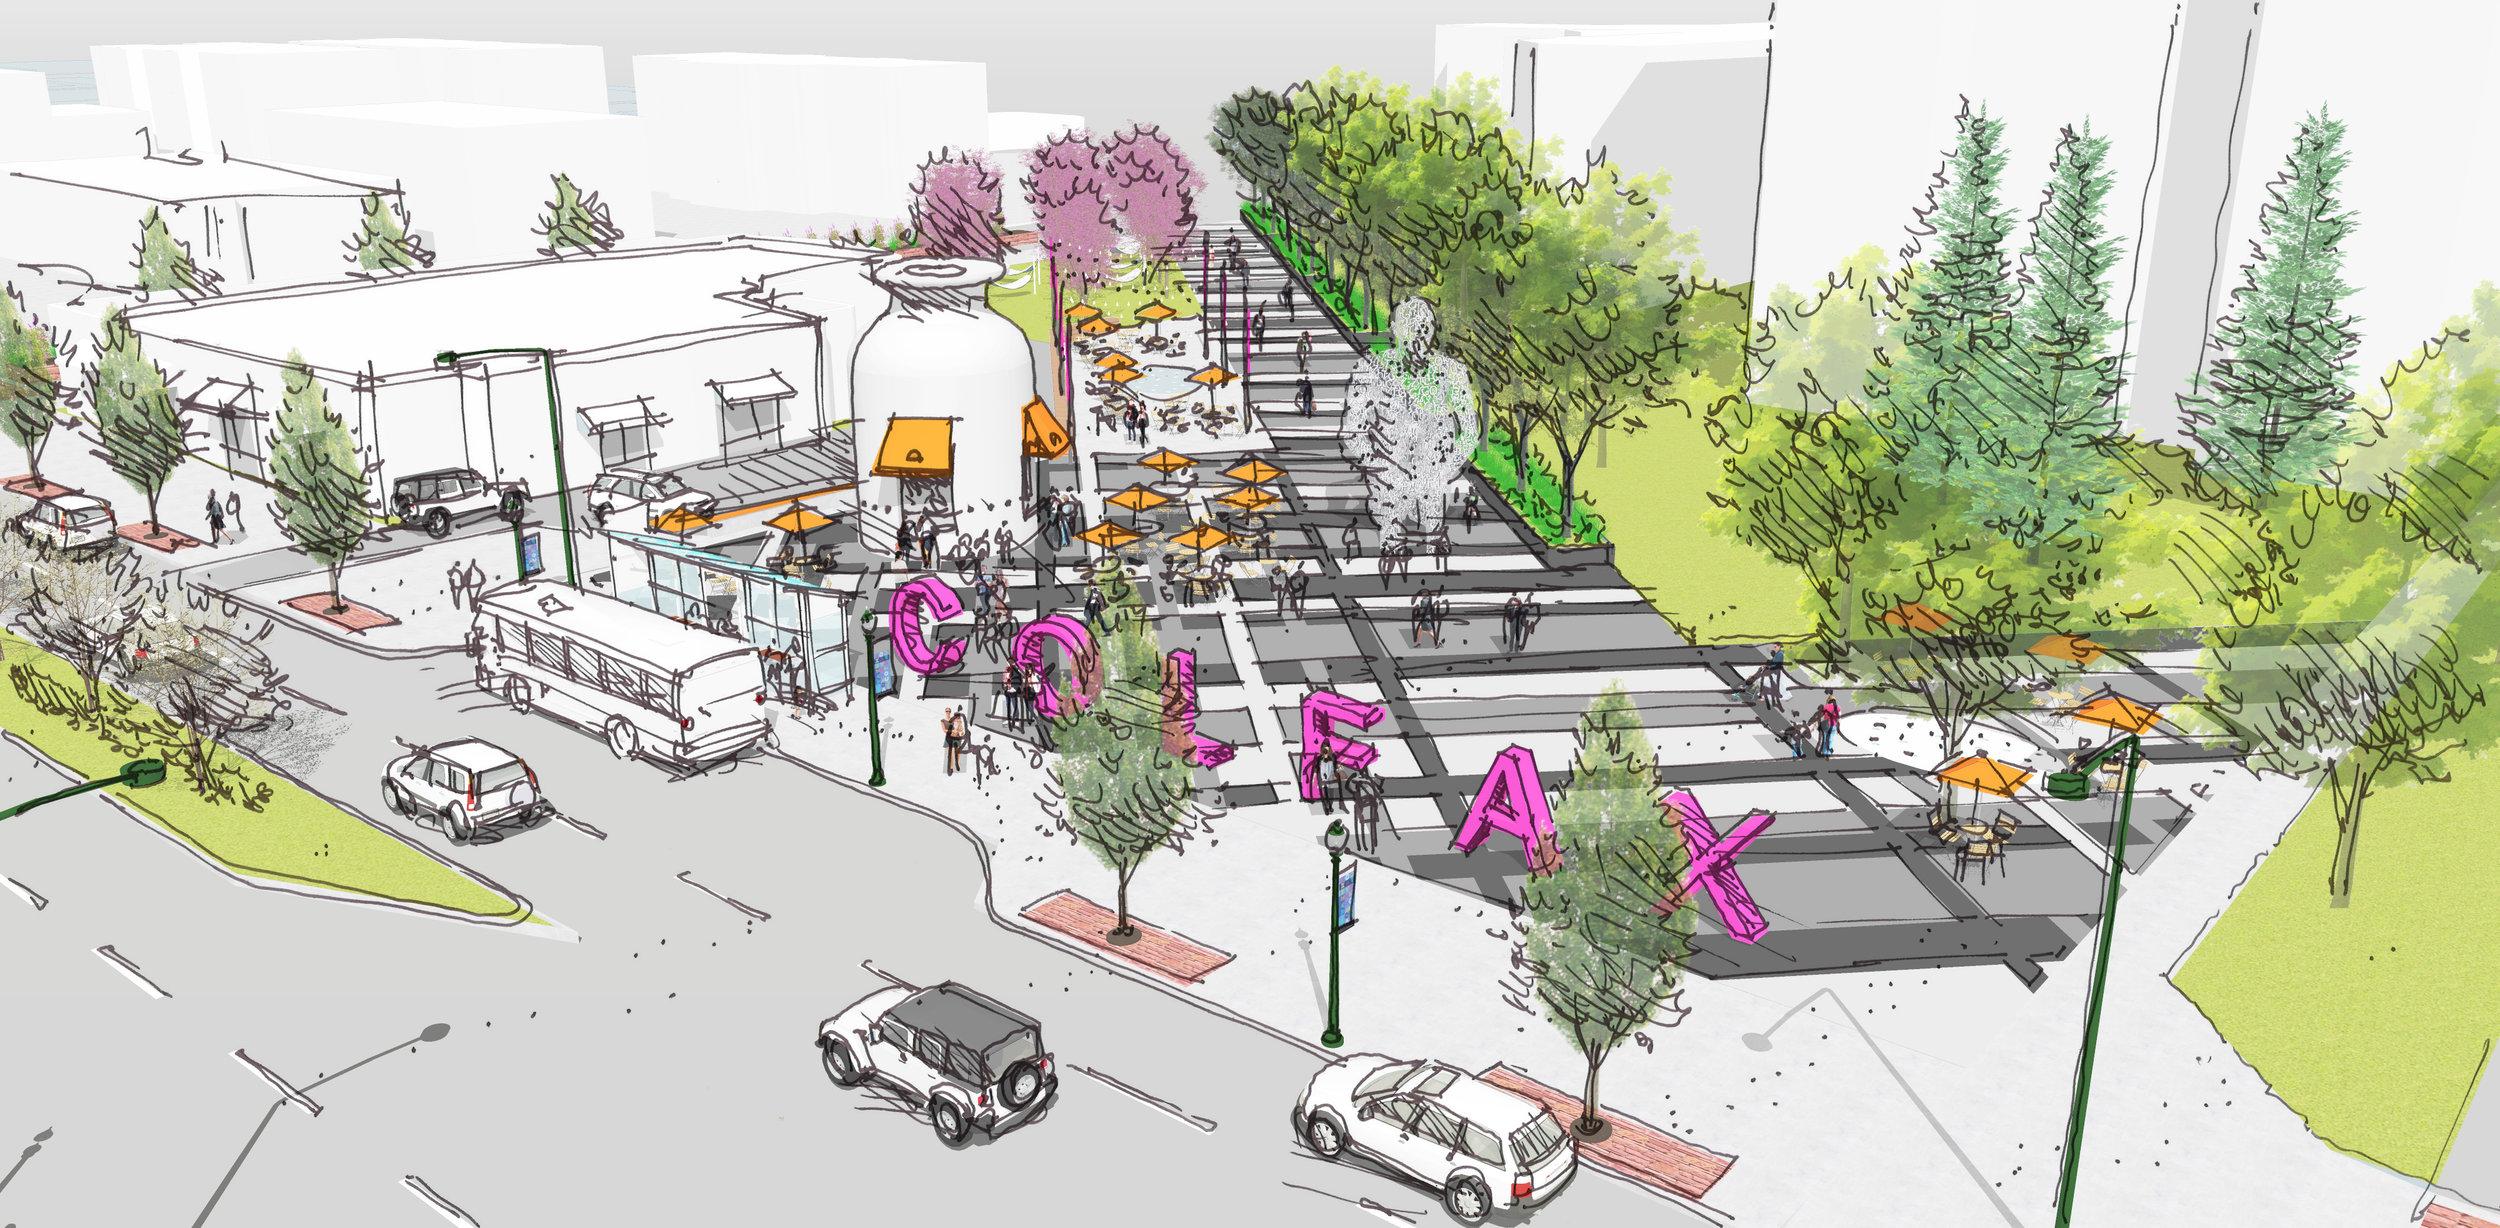 <f>Services</f><f>Planning</f><f>Services</f><f>UrbanDesign</f><f>Markets</f><f>UrbanDesign+Planning</f><t>Colfax Avenue Master Plan</t><m>Denver, CO</m>